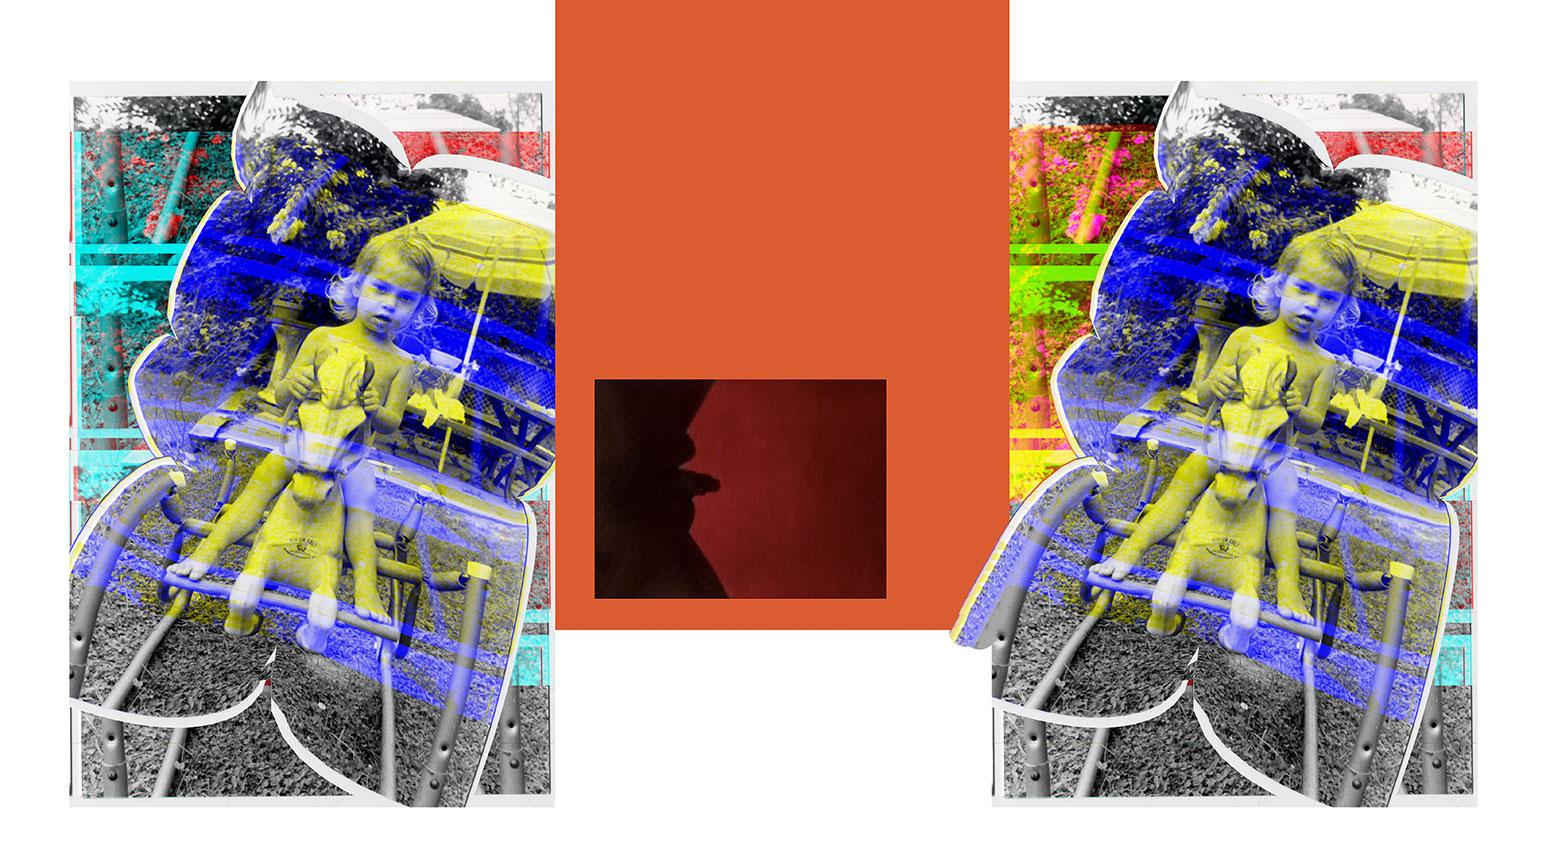 021_Tulah-x2-and-Orange.jpg